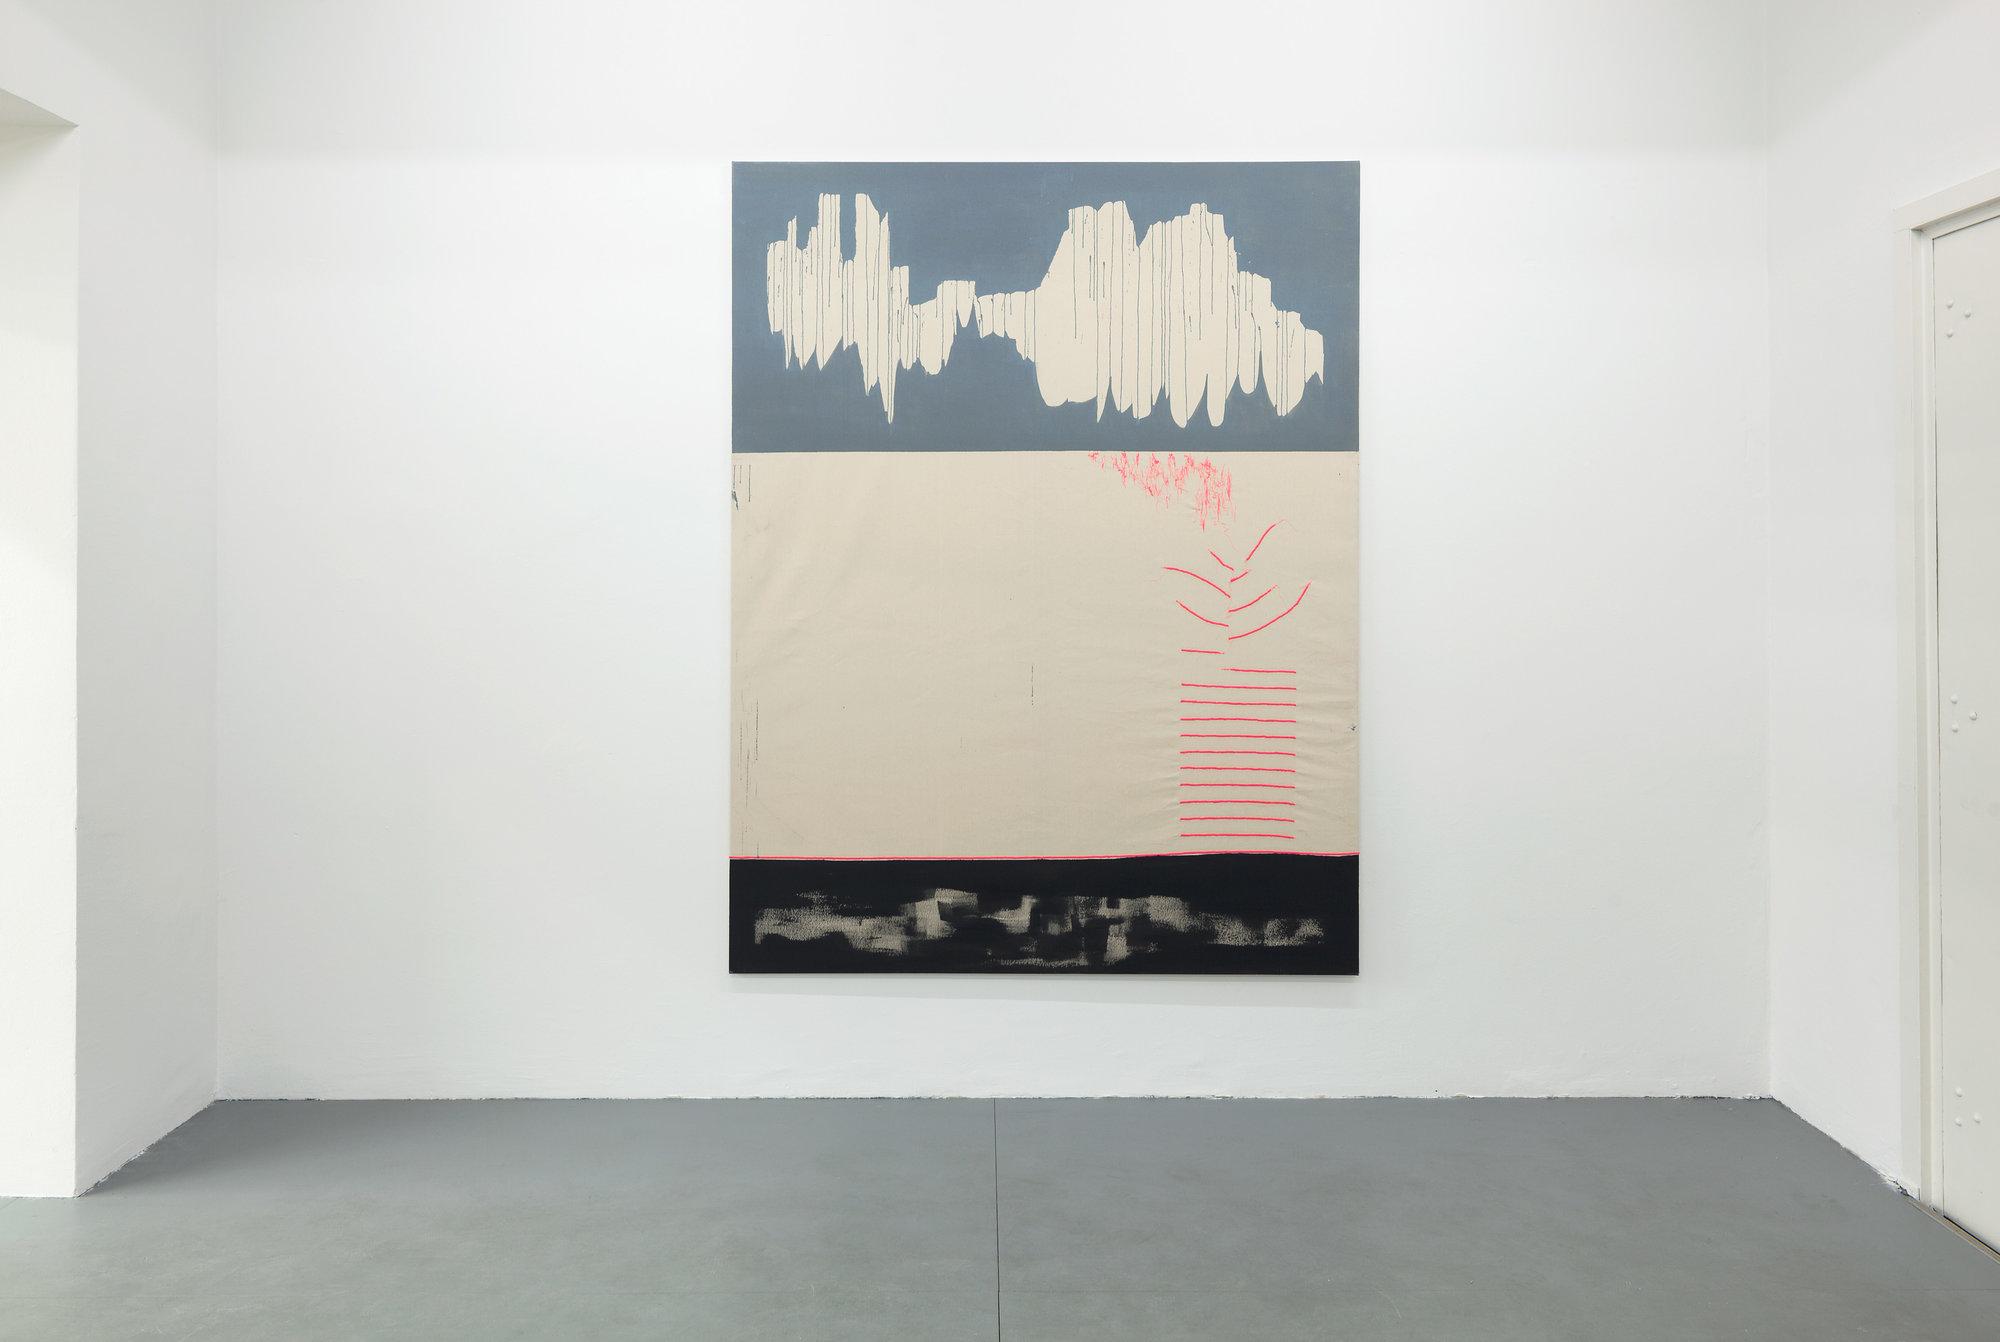 Caroline Corleone, cloud#9, installation view solo show, Krobath Wien, credits Rudolf Strobl, 2016 Courtesy Krobath Wien